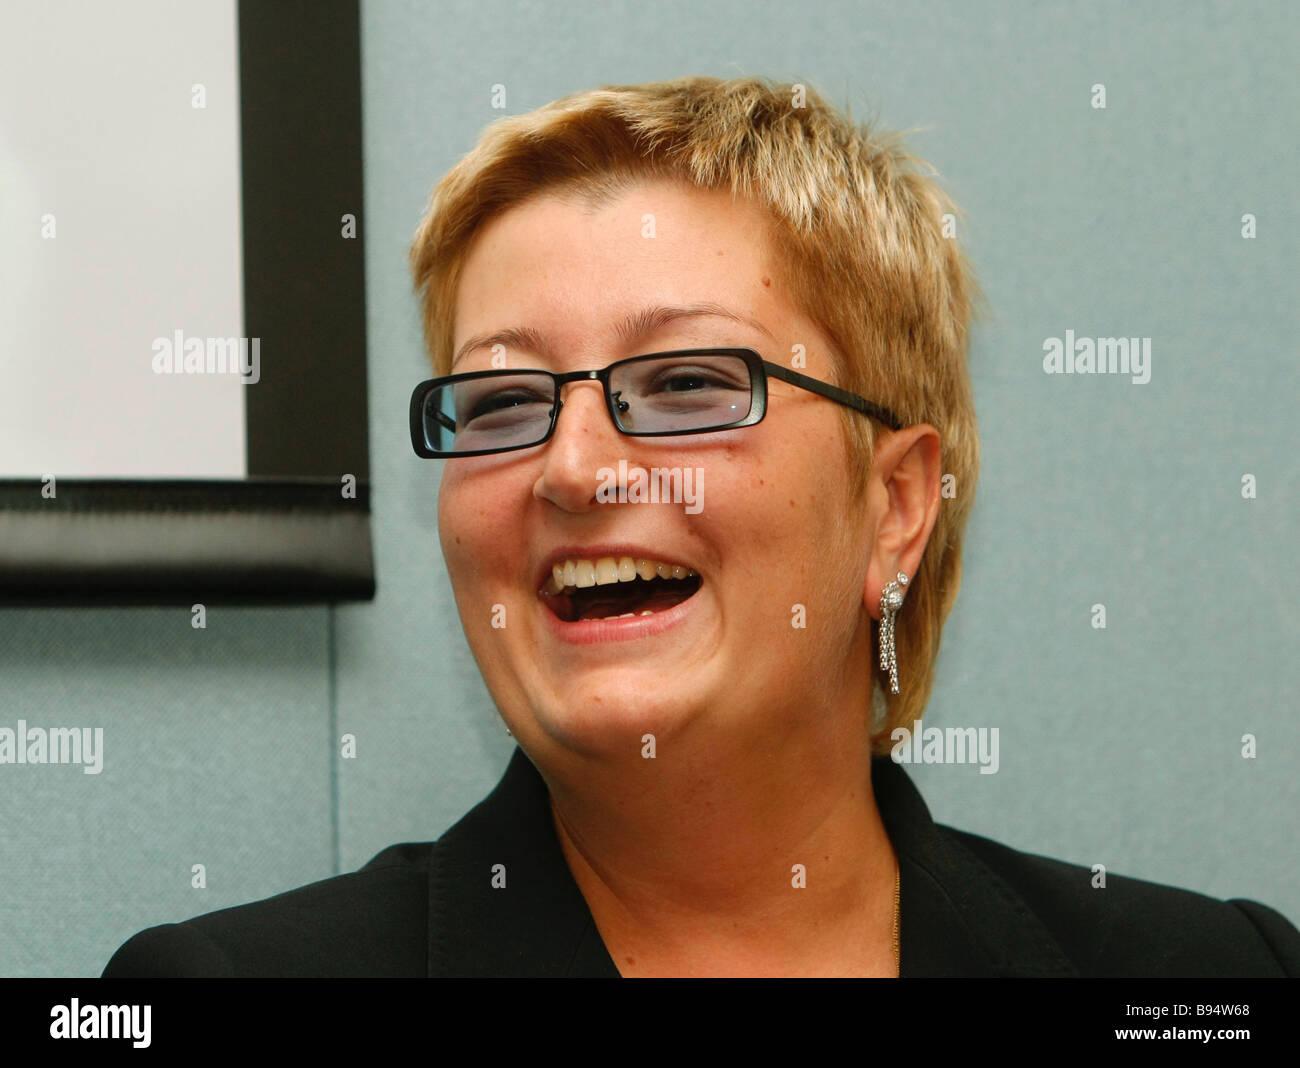 Tatyana Ustinova told how she lost 90 kg 04.05.2009 28